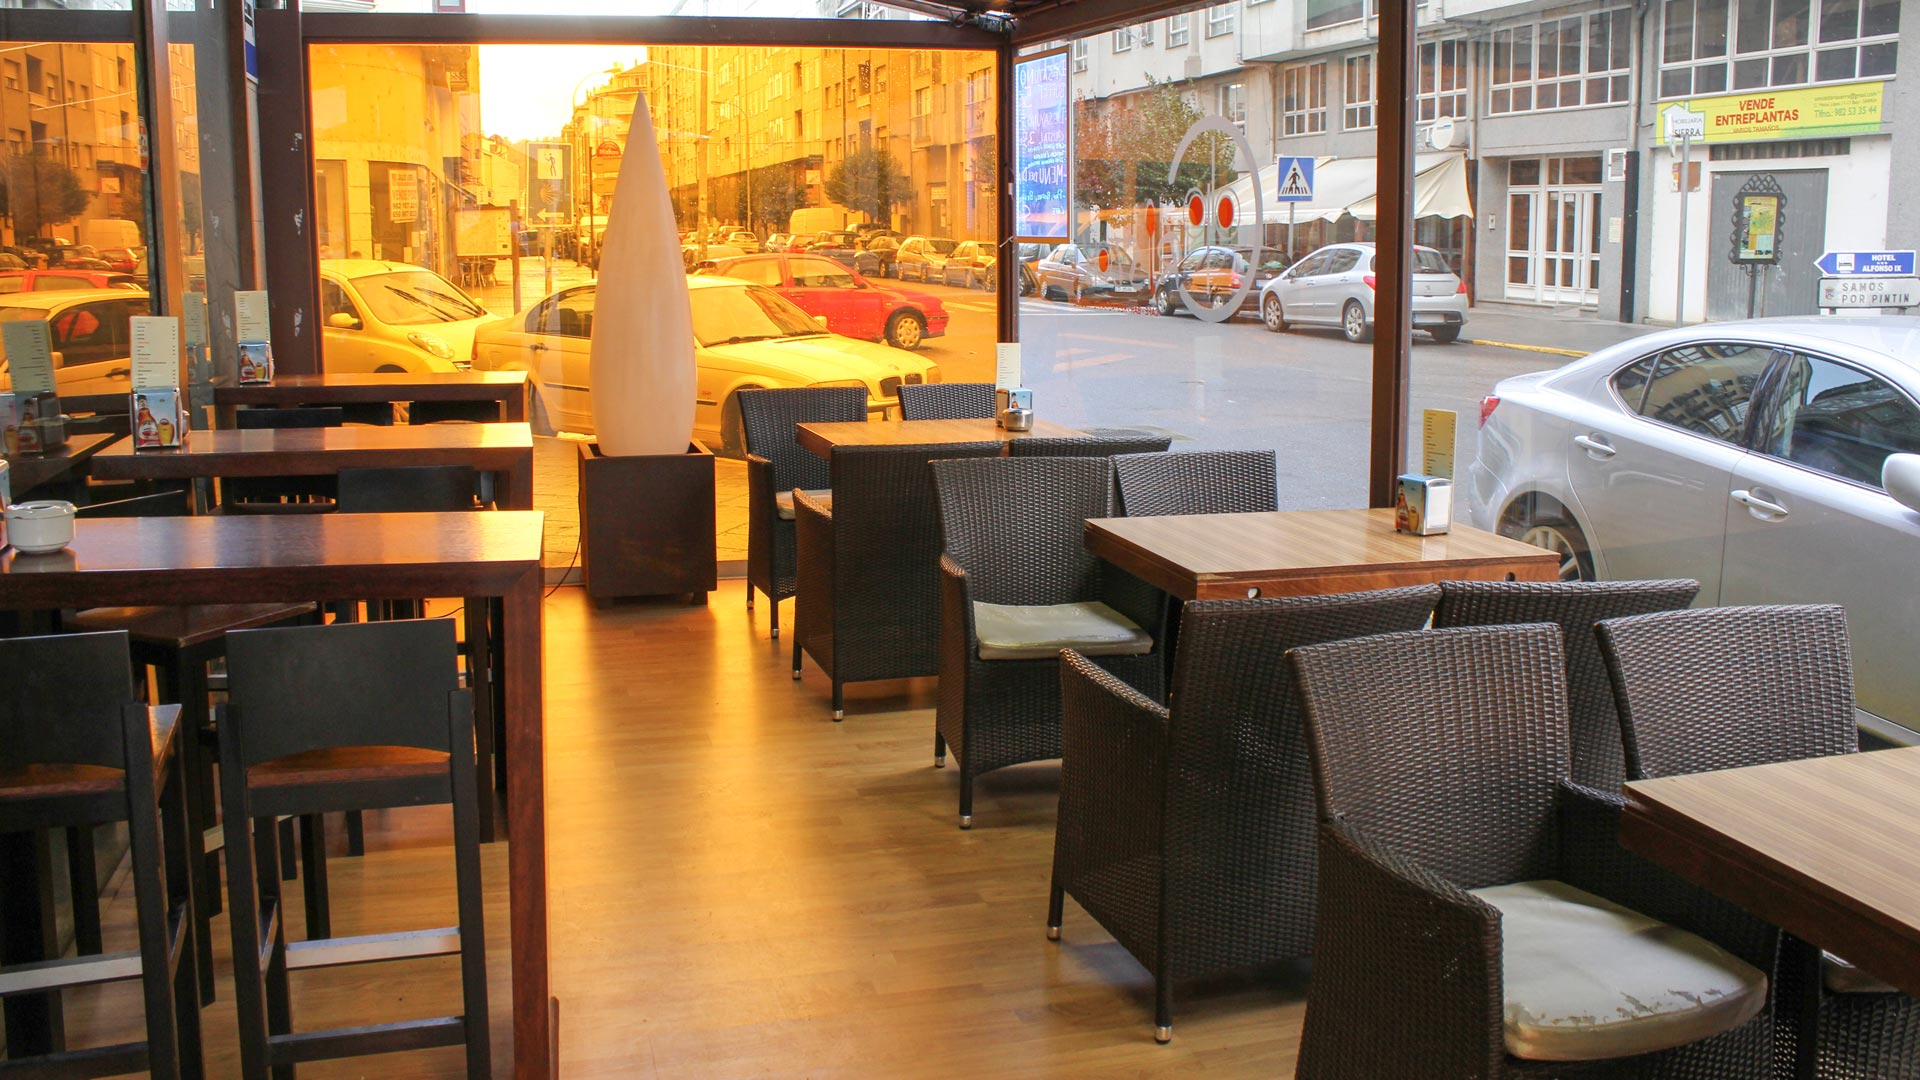 dpcristal-restaurante-albergue-slider5